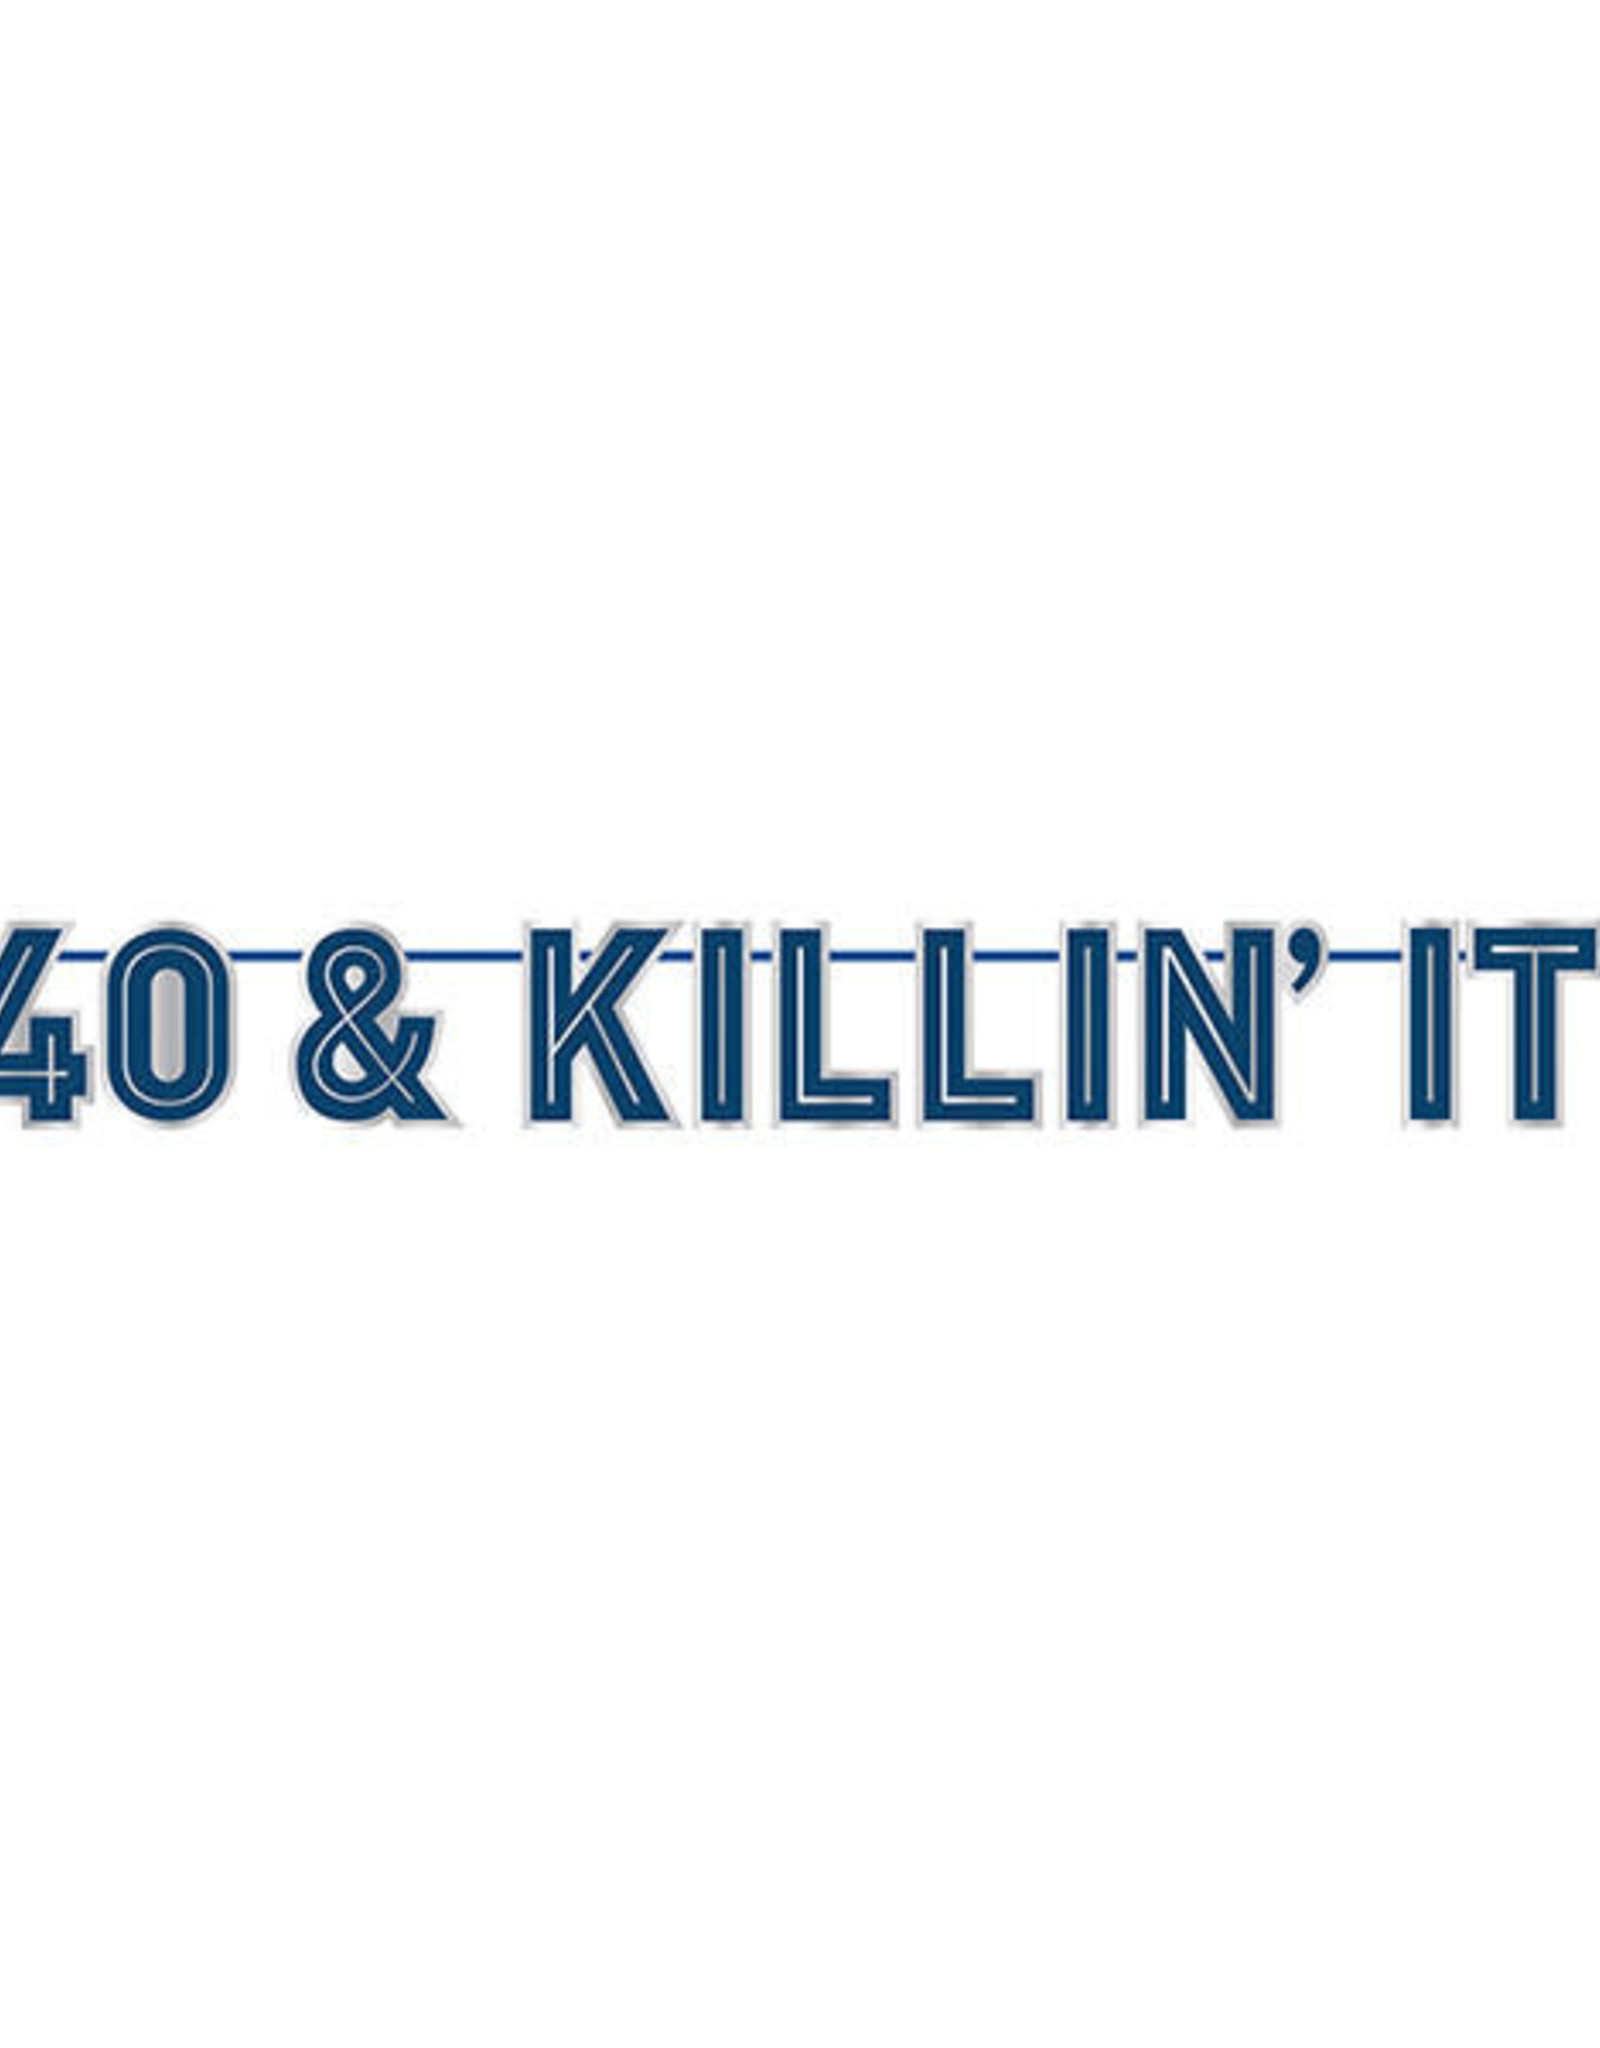 '40 & Killin' It!' 40th Birthday Banner